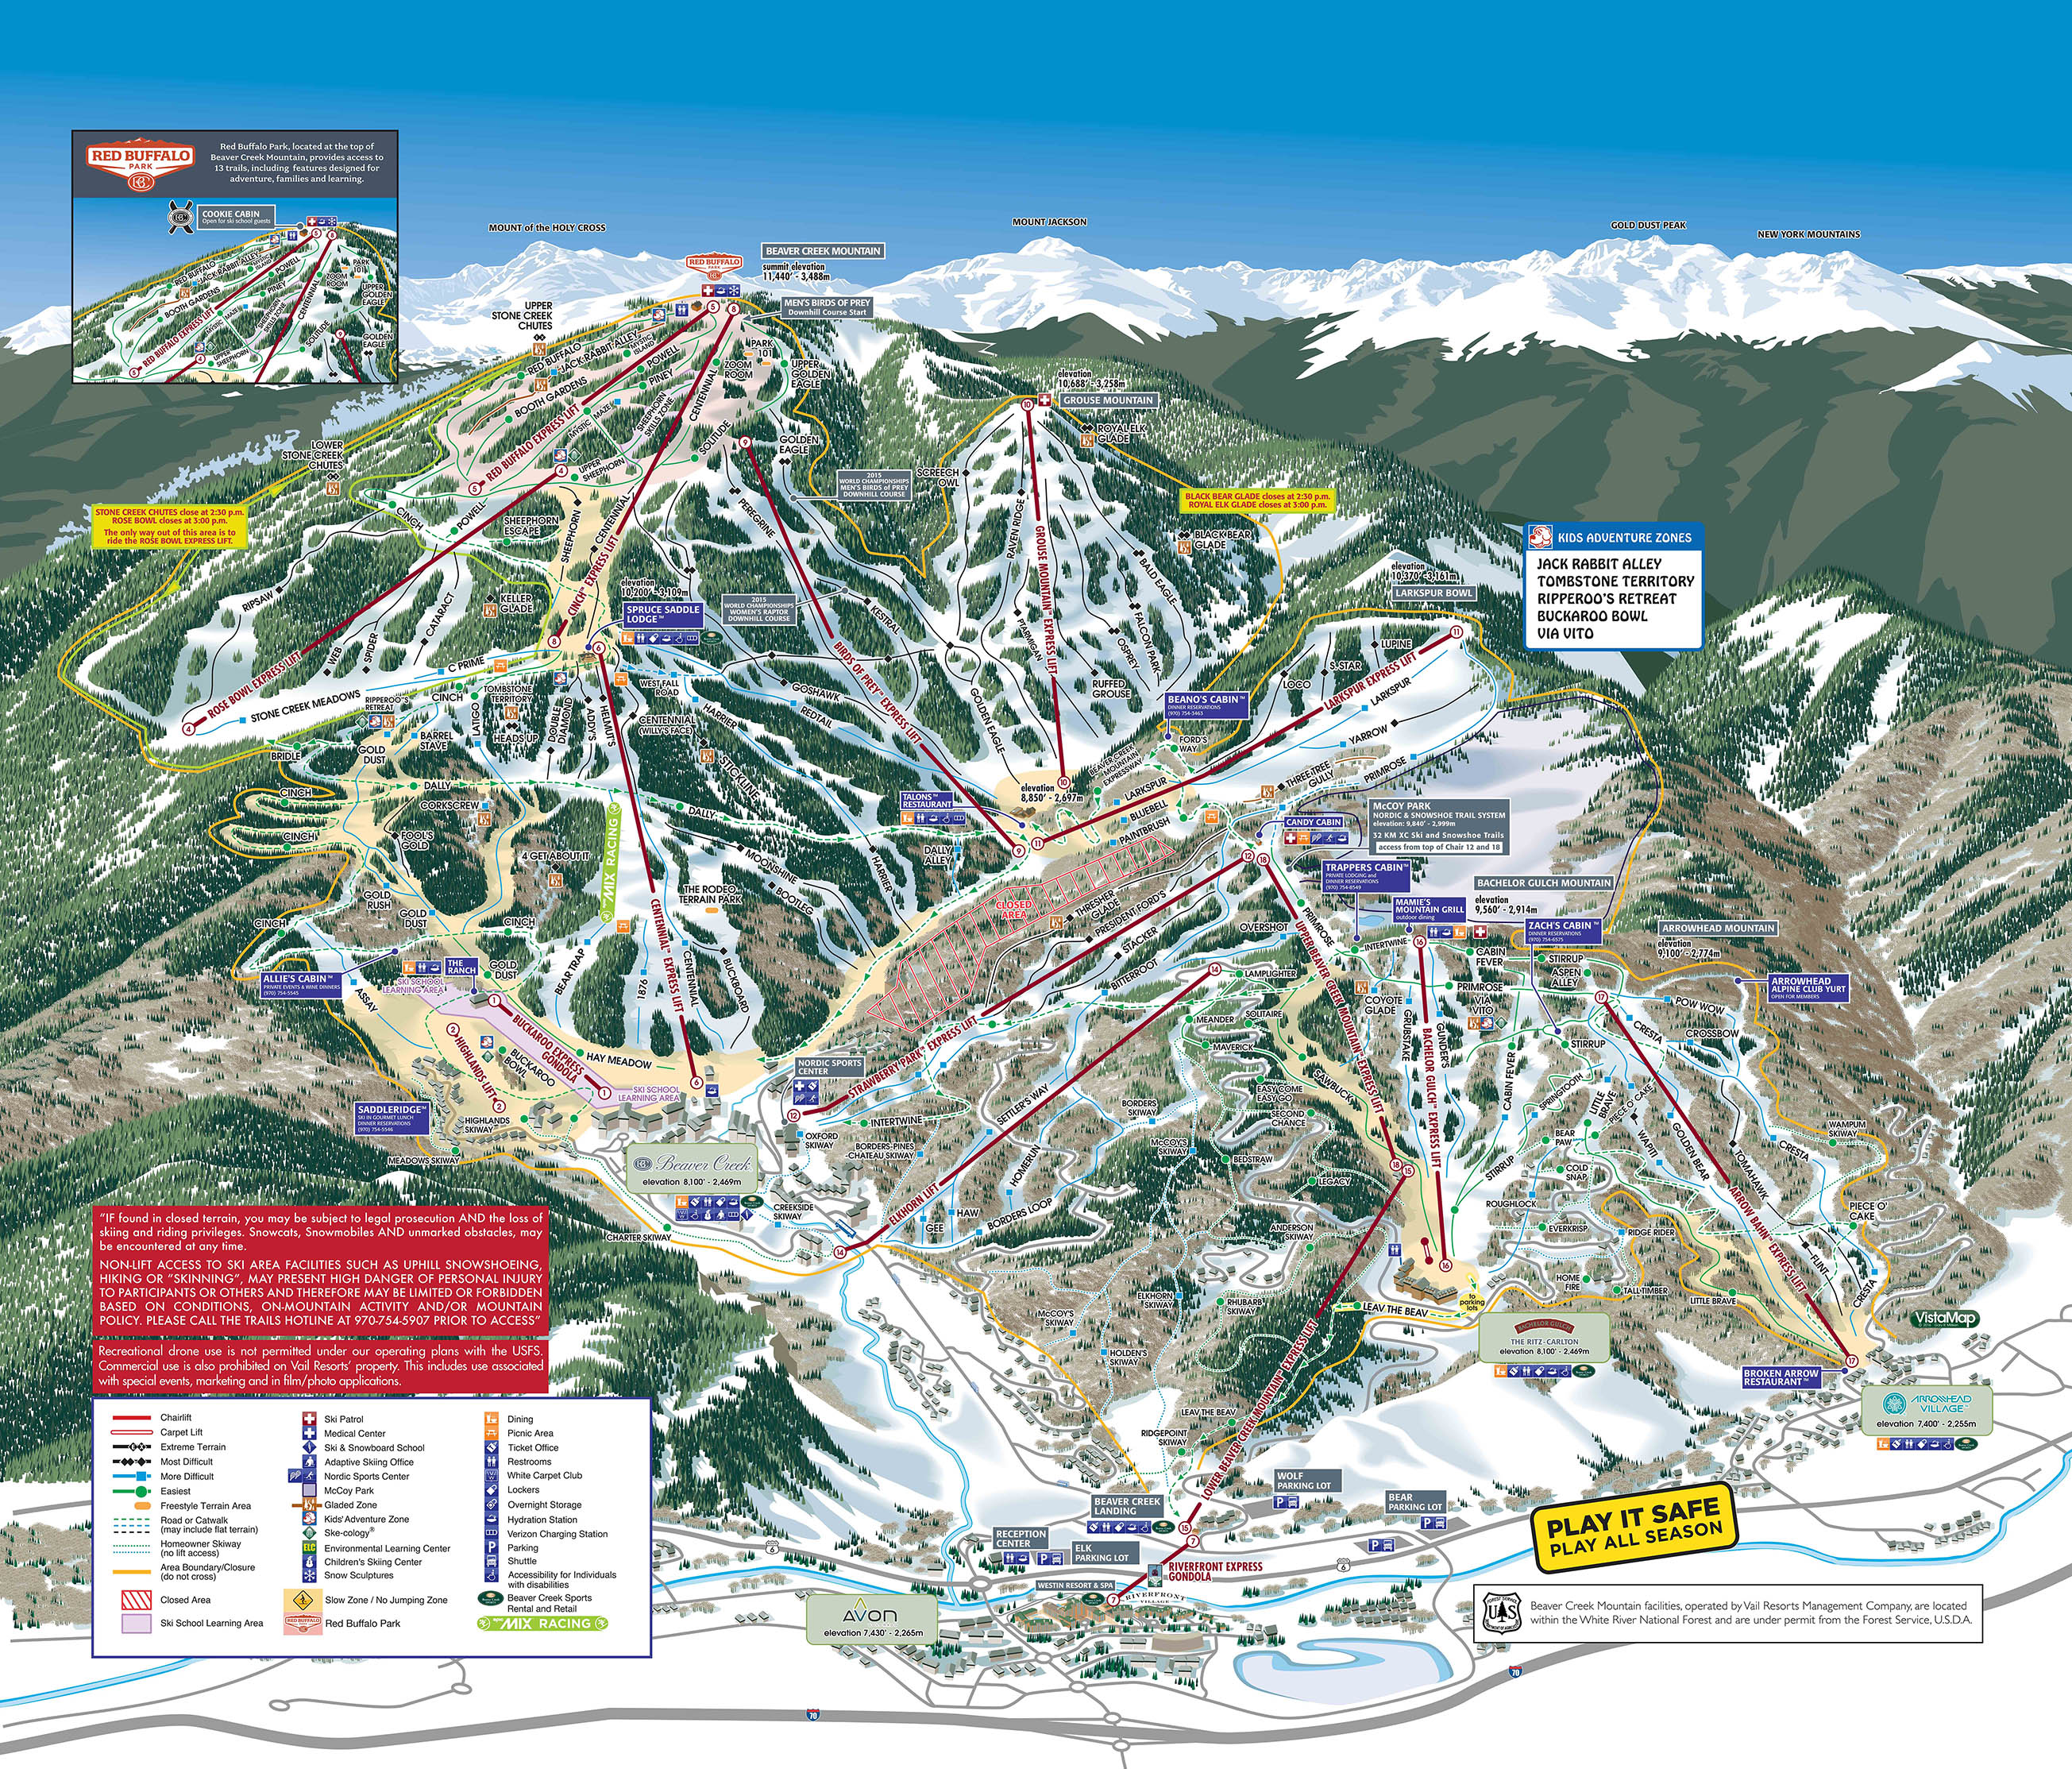 Beaver Creek map